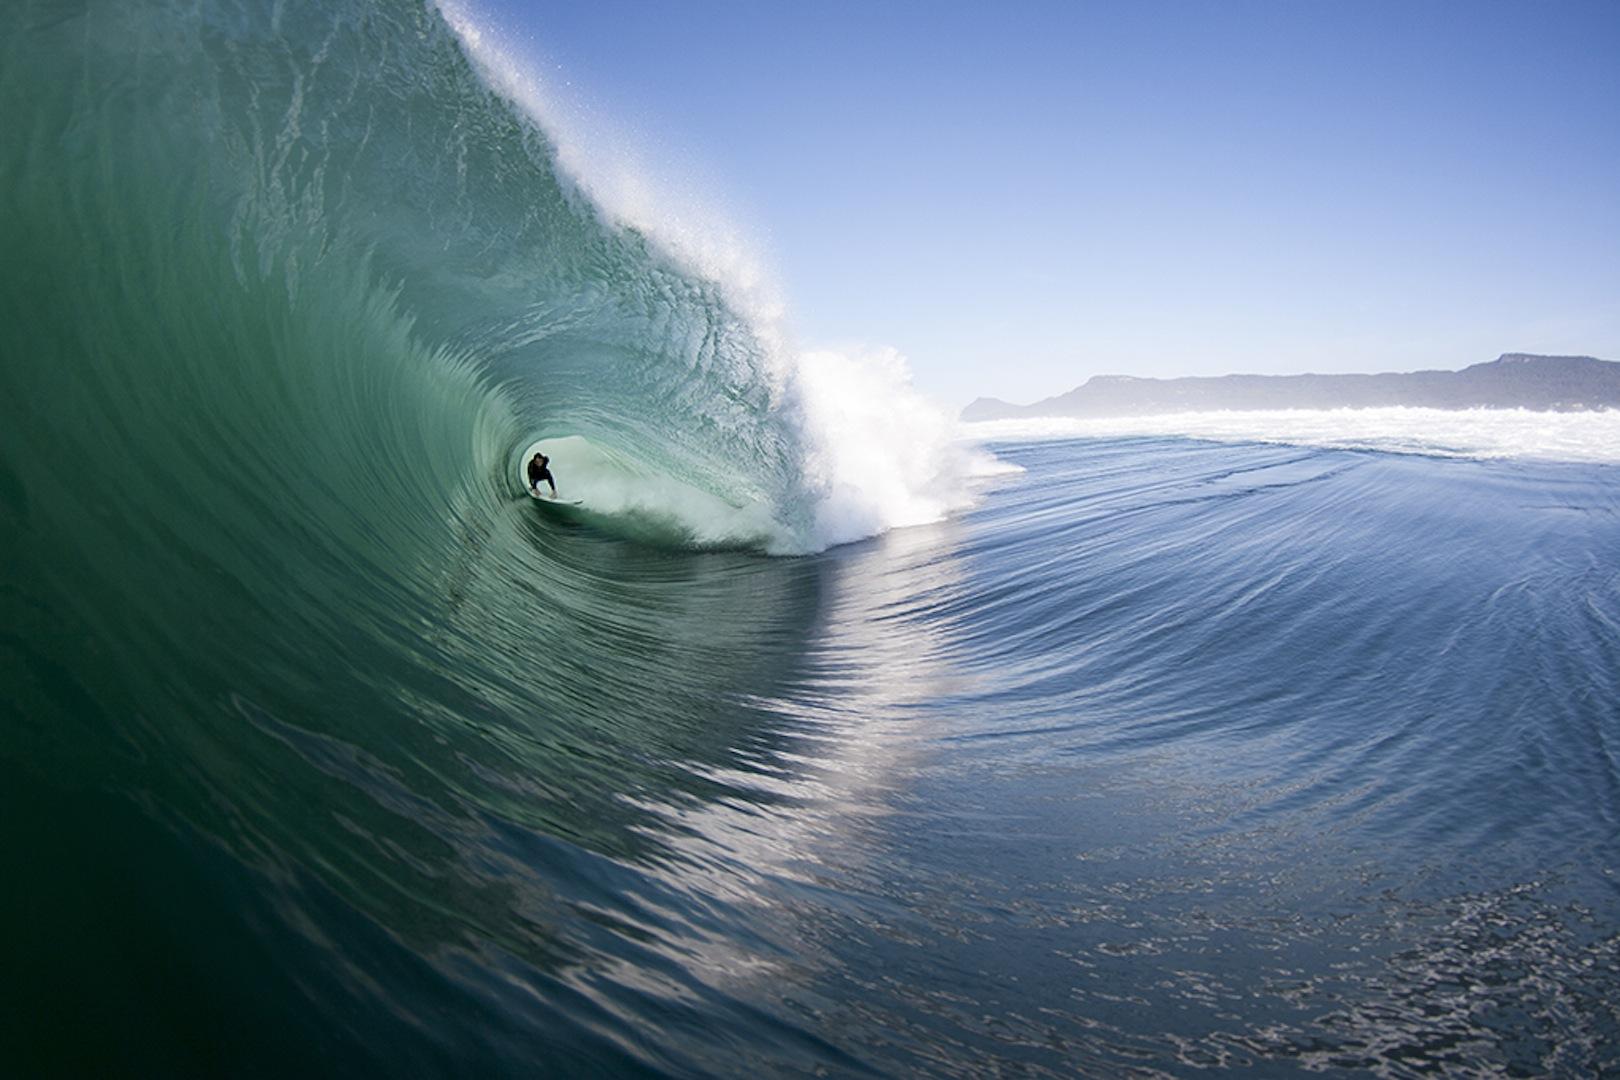 Sensational: Coal Miner Makes Surf Book of Year!